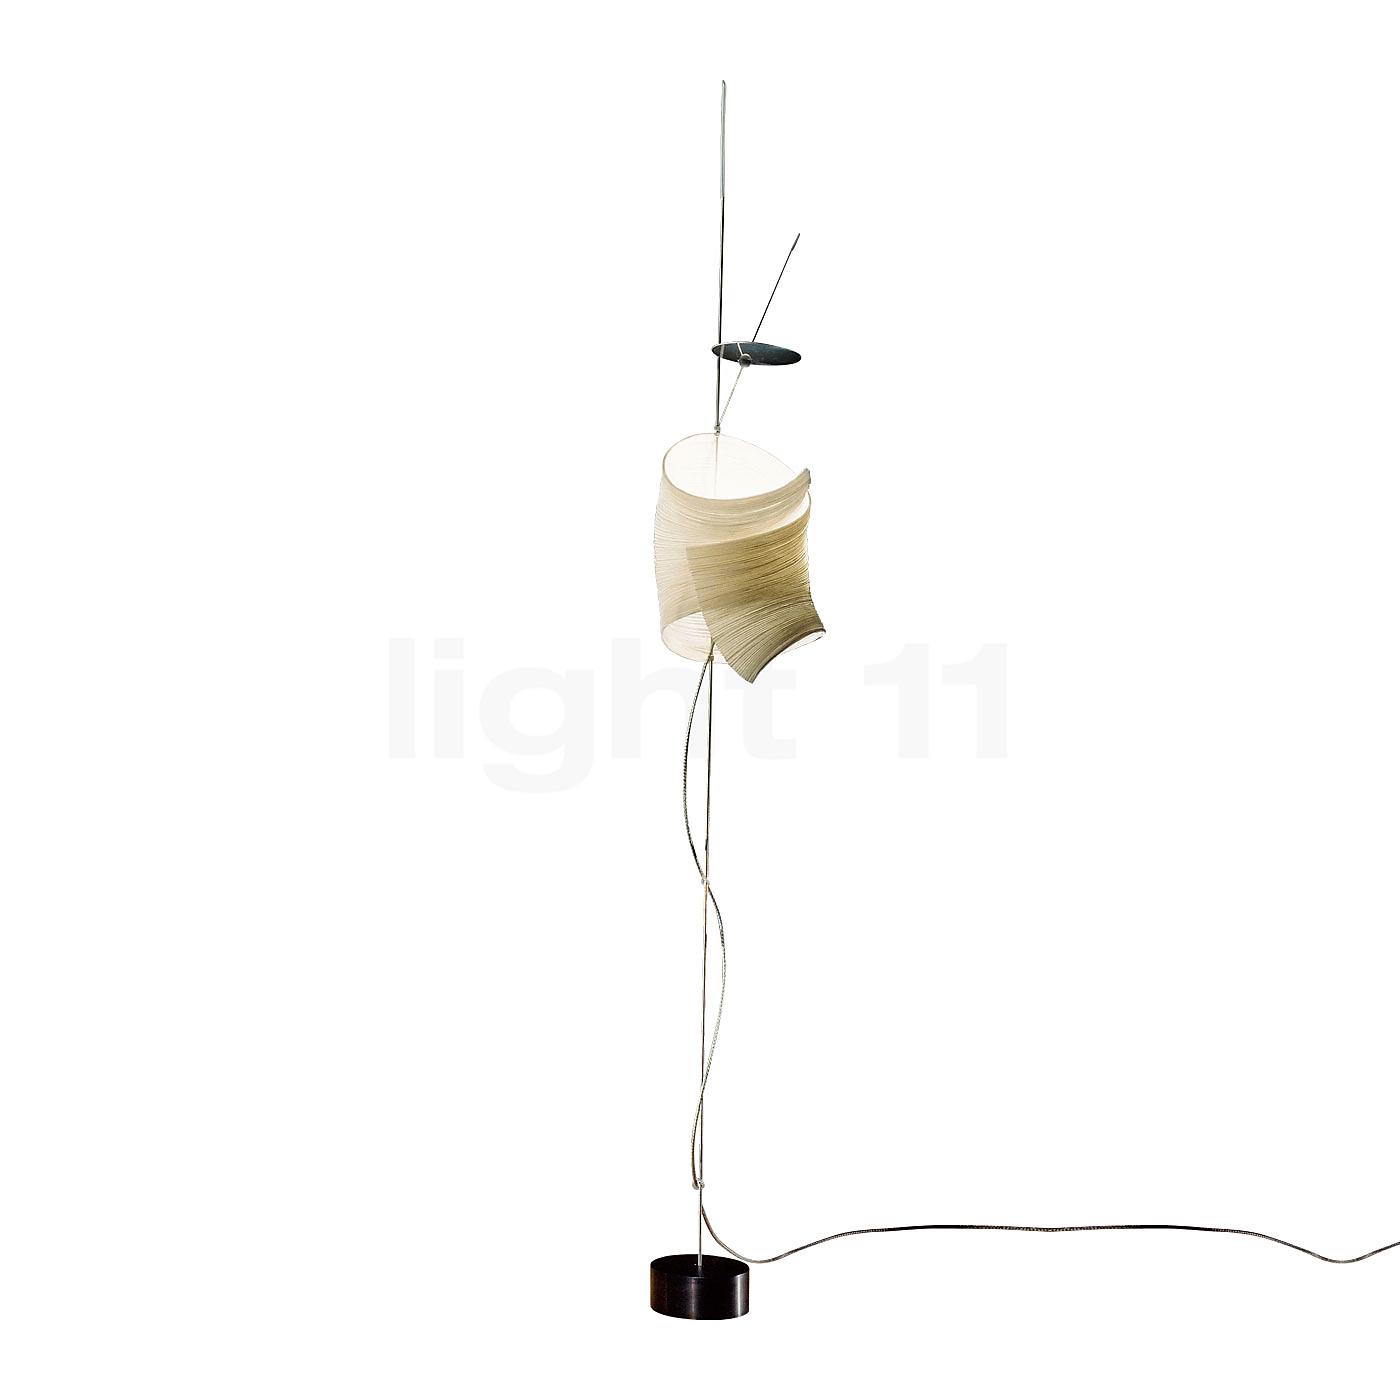 ingo maurer the tribe watapunga lampadaires lampes luminaires. Black Bedroom Furniture Sets. Home Design Ideas